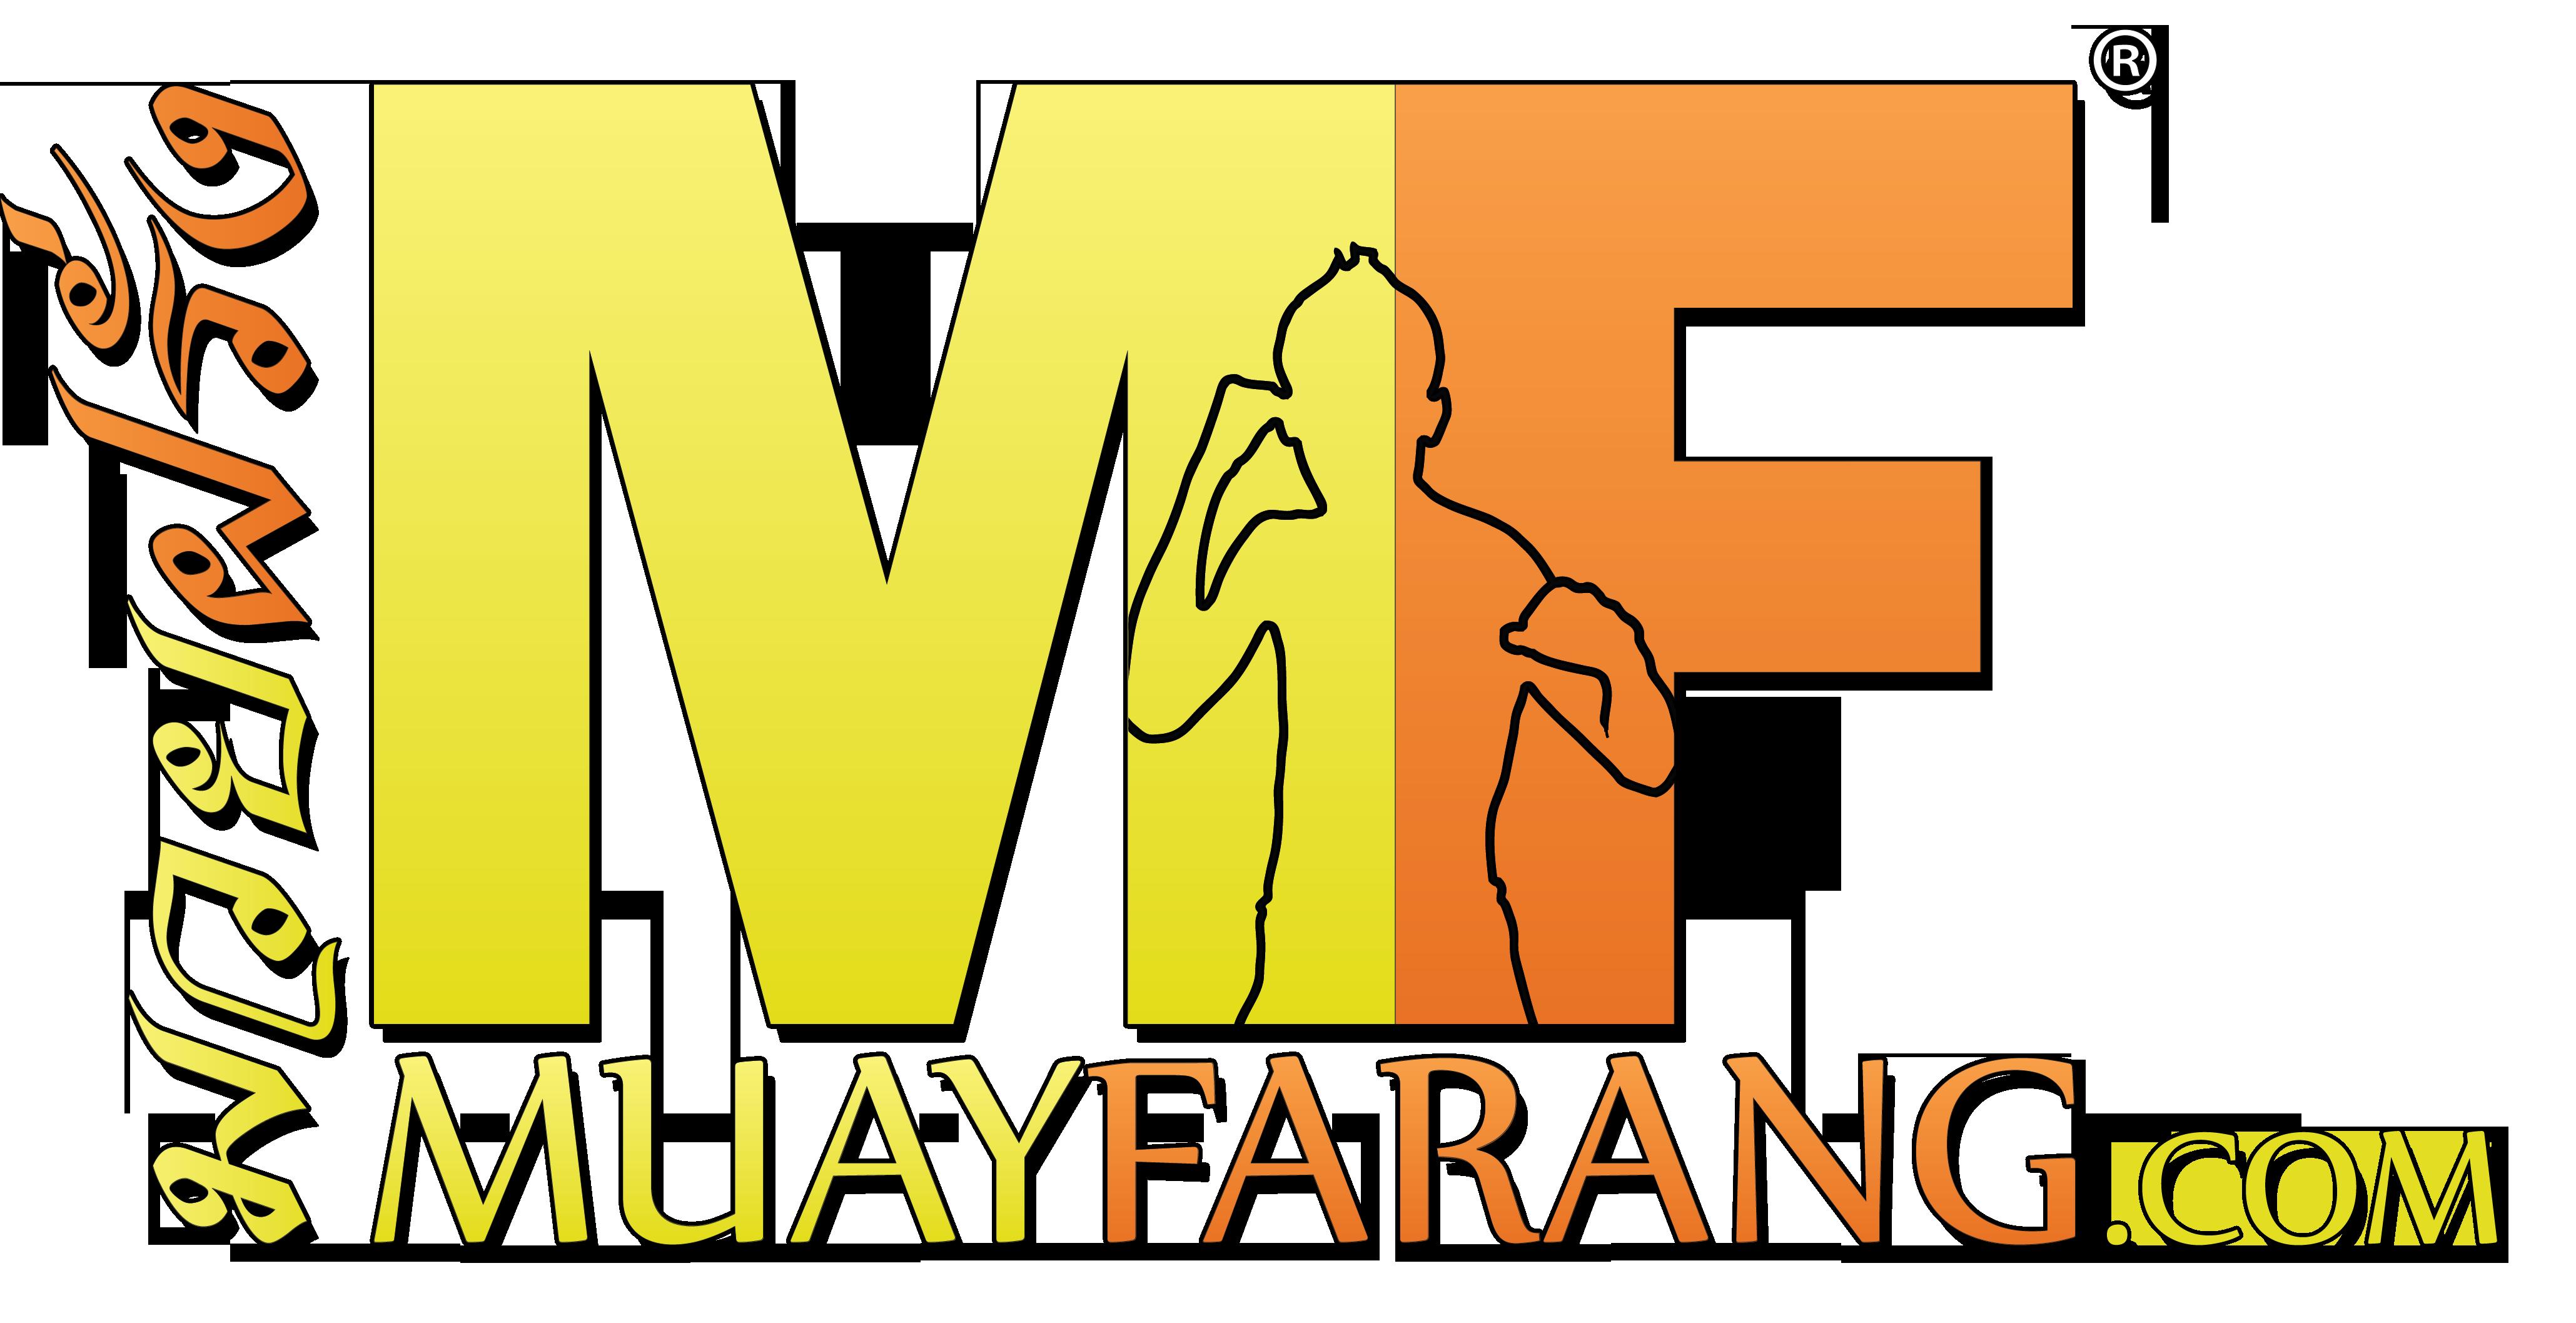 Muay Farang - Muay Thai News